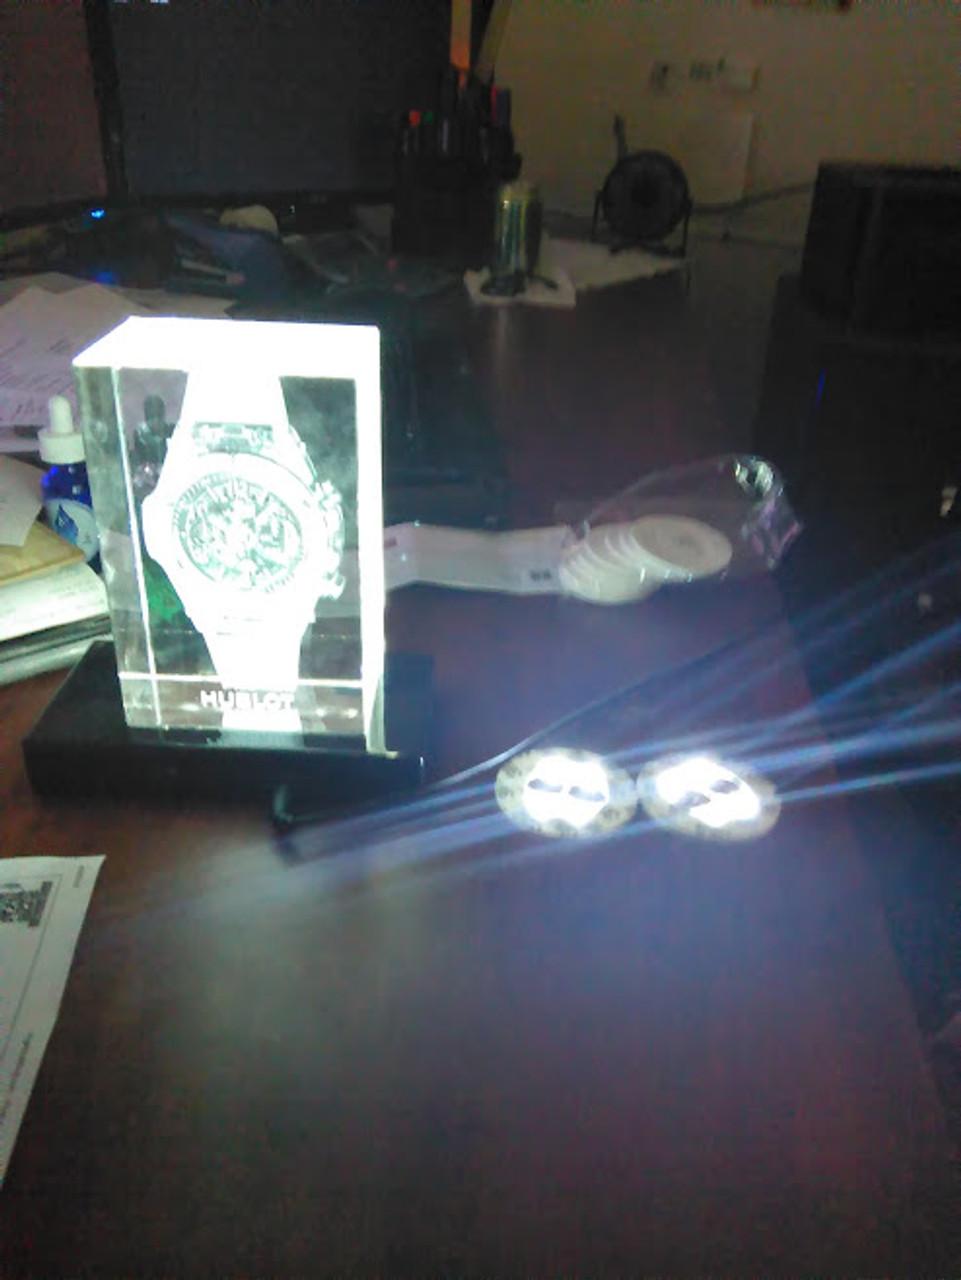 LED,Pad, Light up, Stick on, sticker, glorifier, wireless, battery powered, LED Sticker